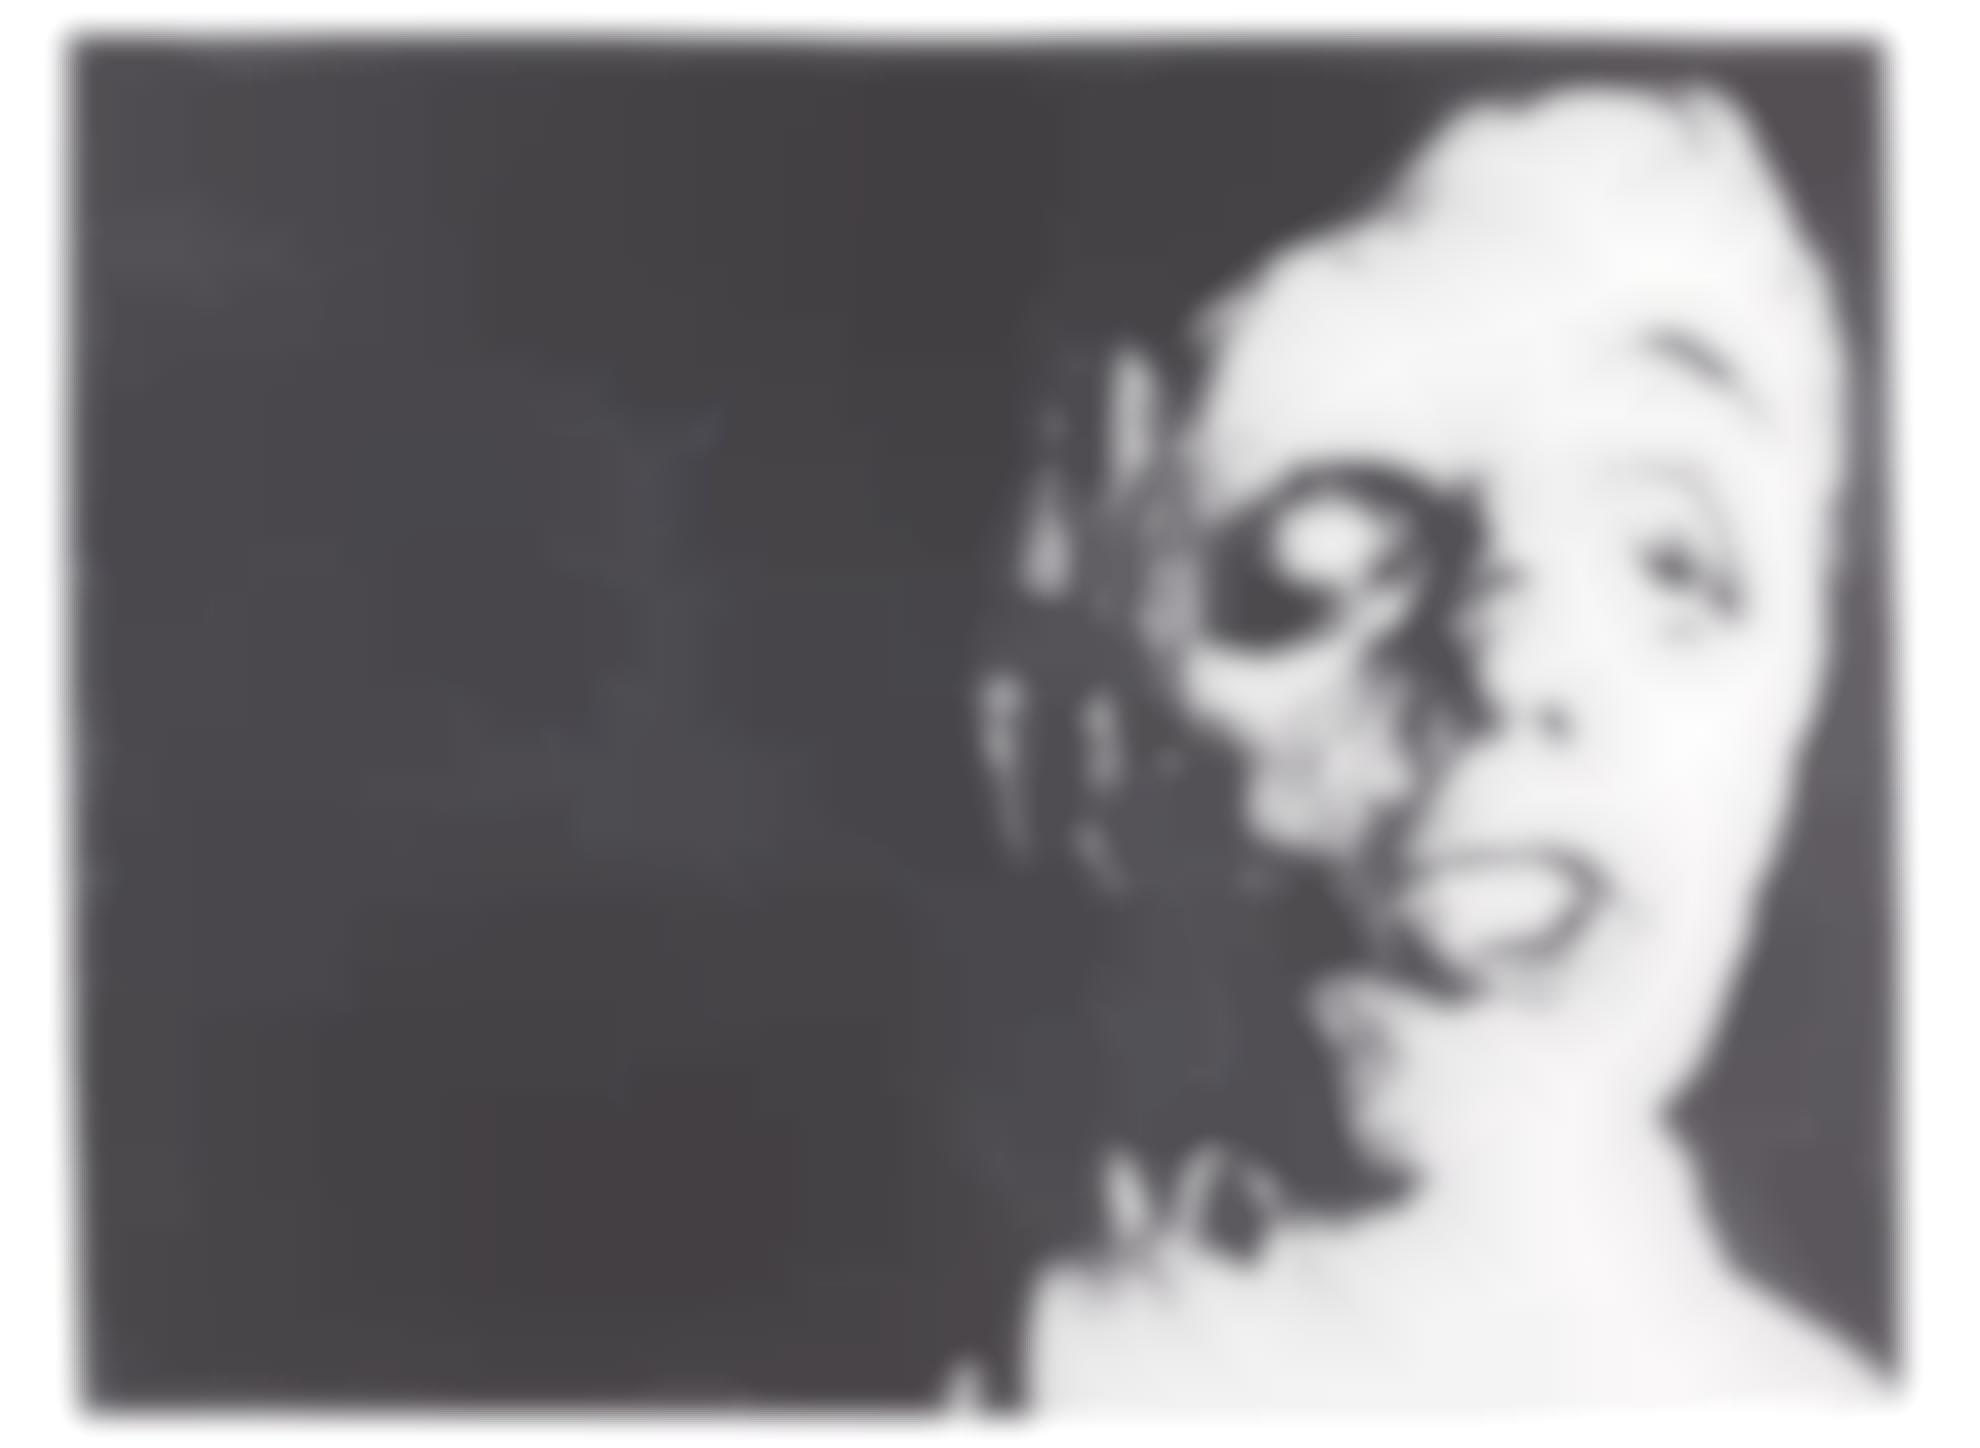 Banks Violette-Negative Creep-2003